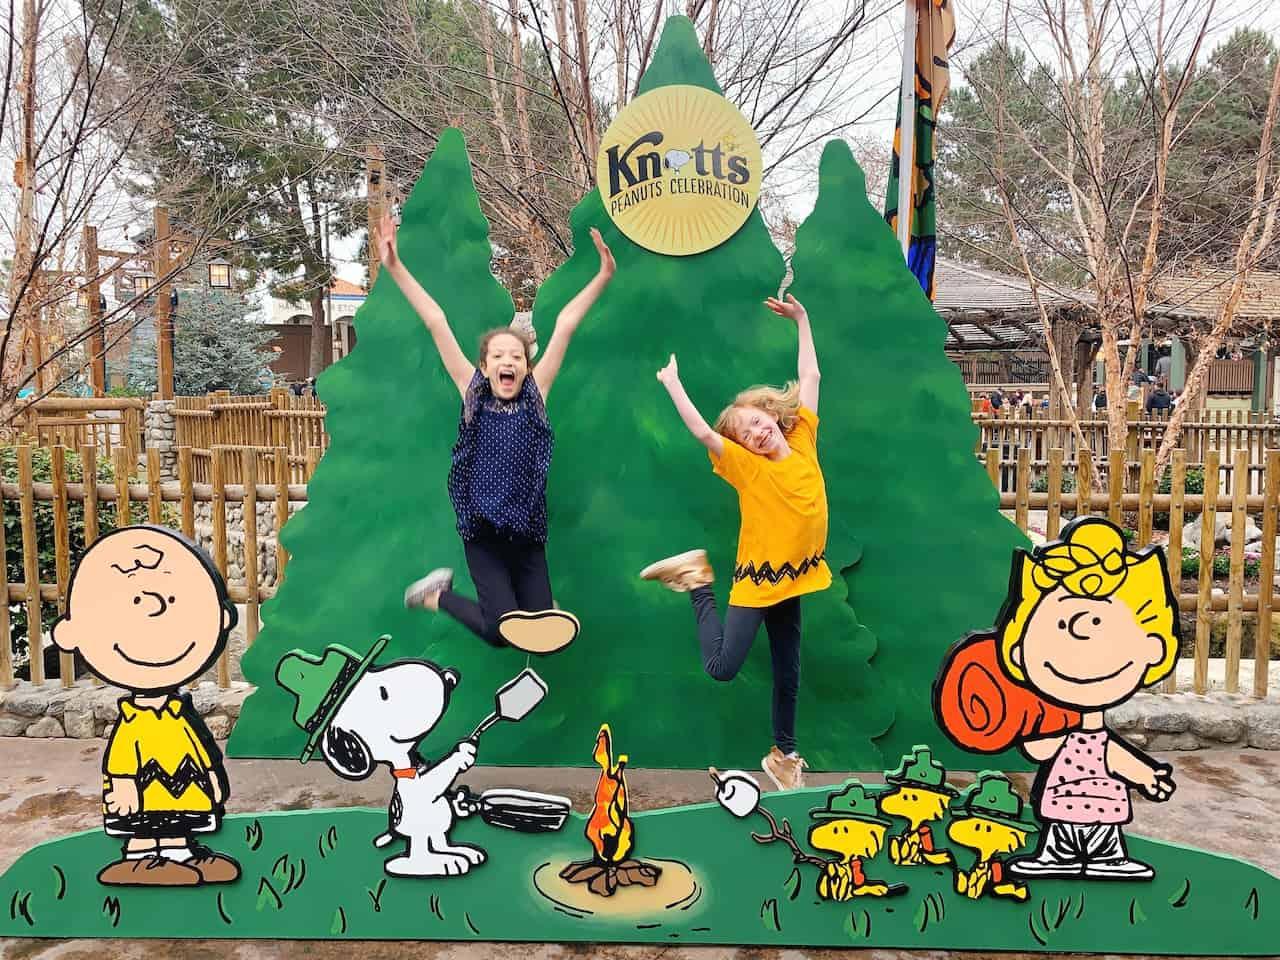 2020 Knotts Peanuts Celebration